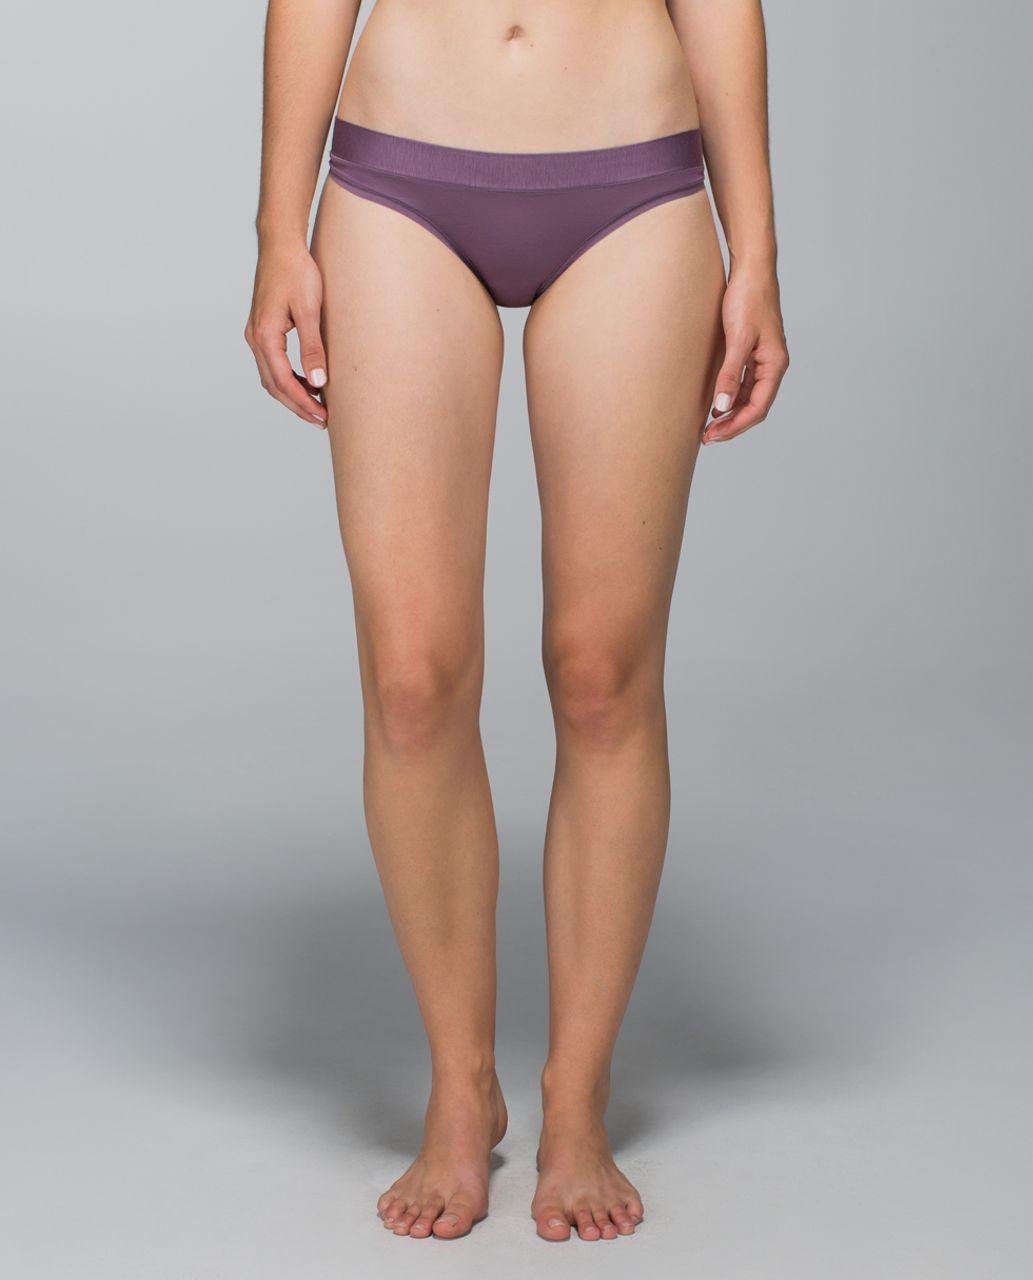 Lululemon Mula Bandhawear Thong - Purple Fog